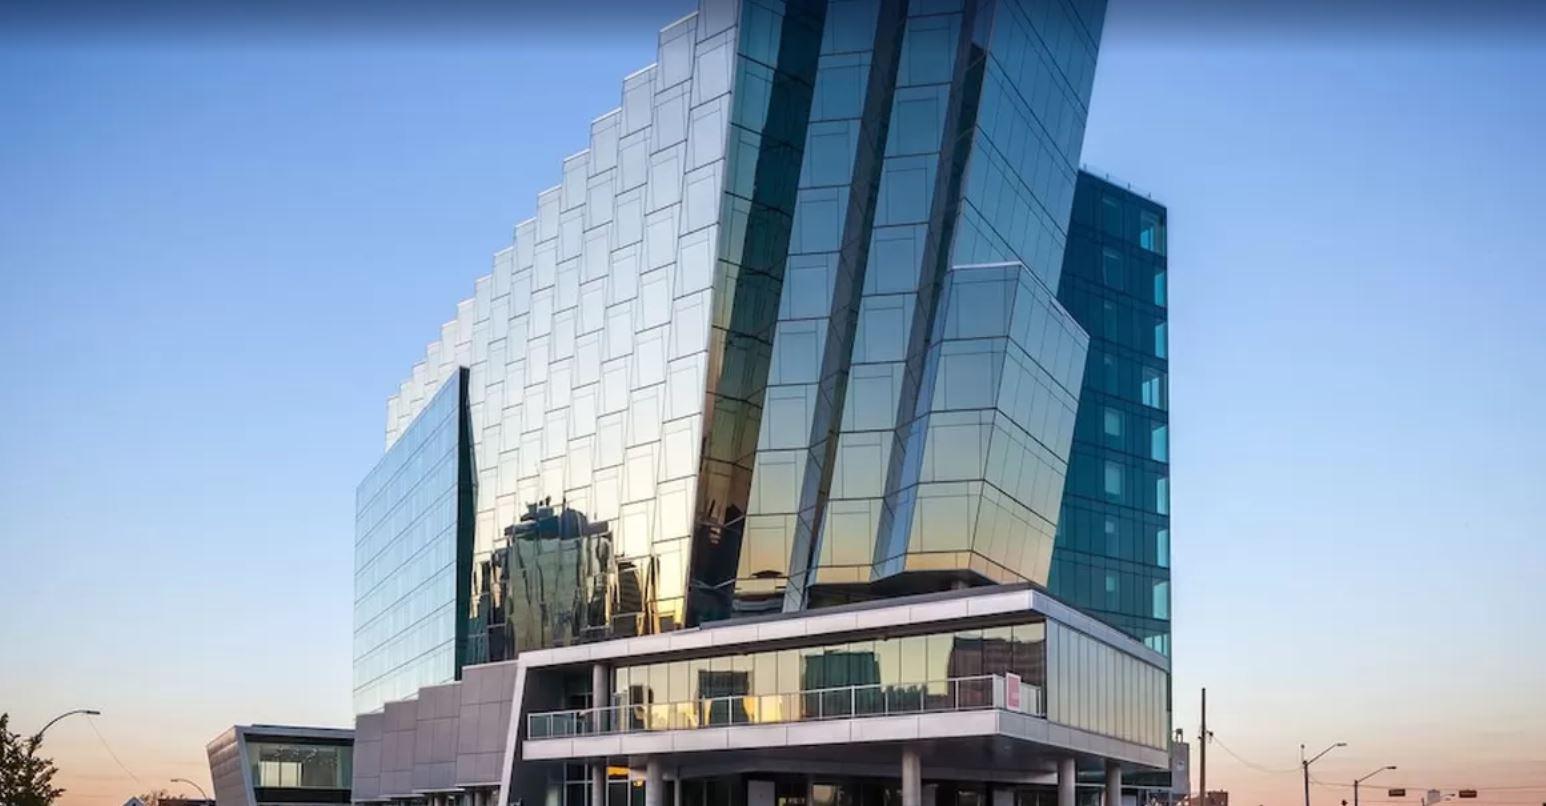 DoubleTree by Hilton Edmonton Downtown, Division No. 11